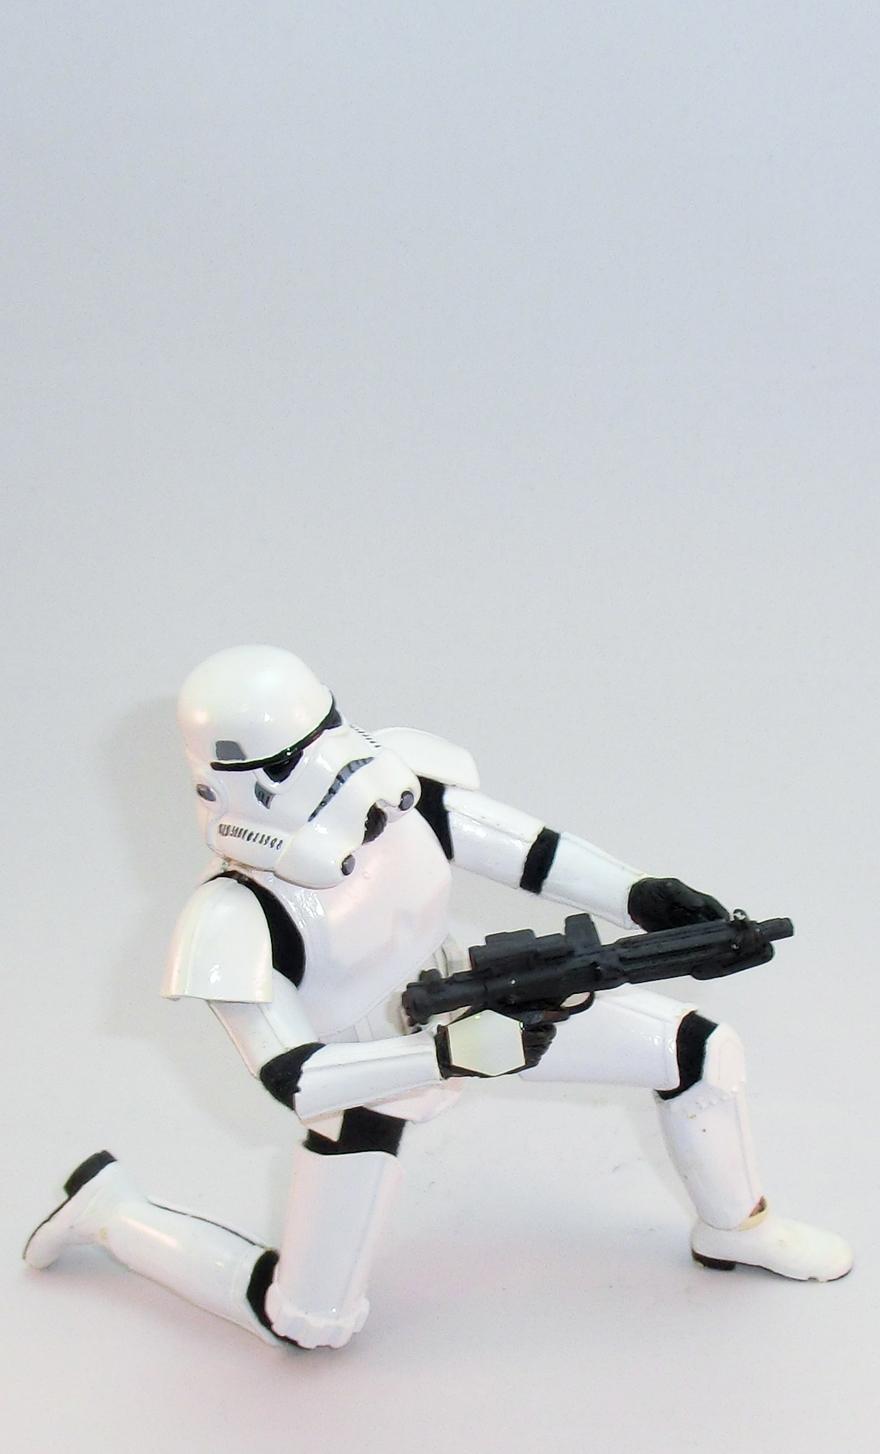 madelman-stormtrooper-star-wars-03